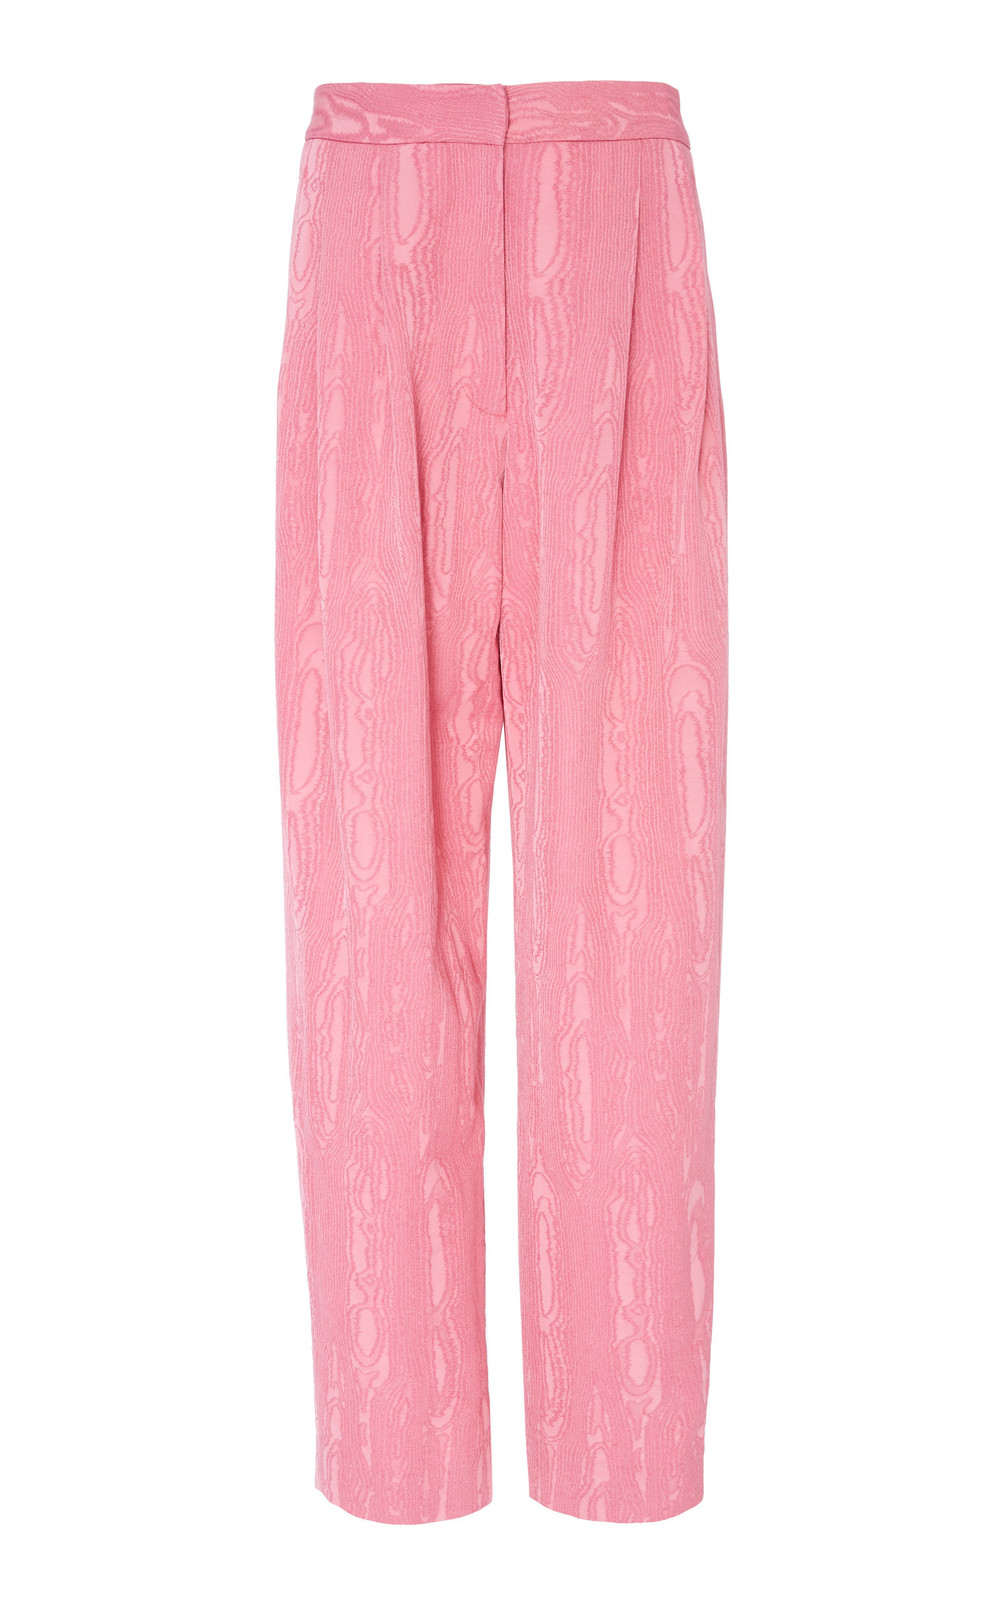 Rachel Comey Thorough Jacquard Wide Leg Pant in pink